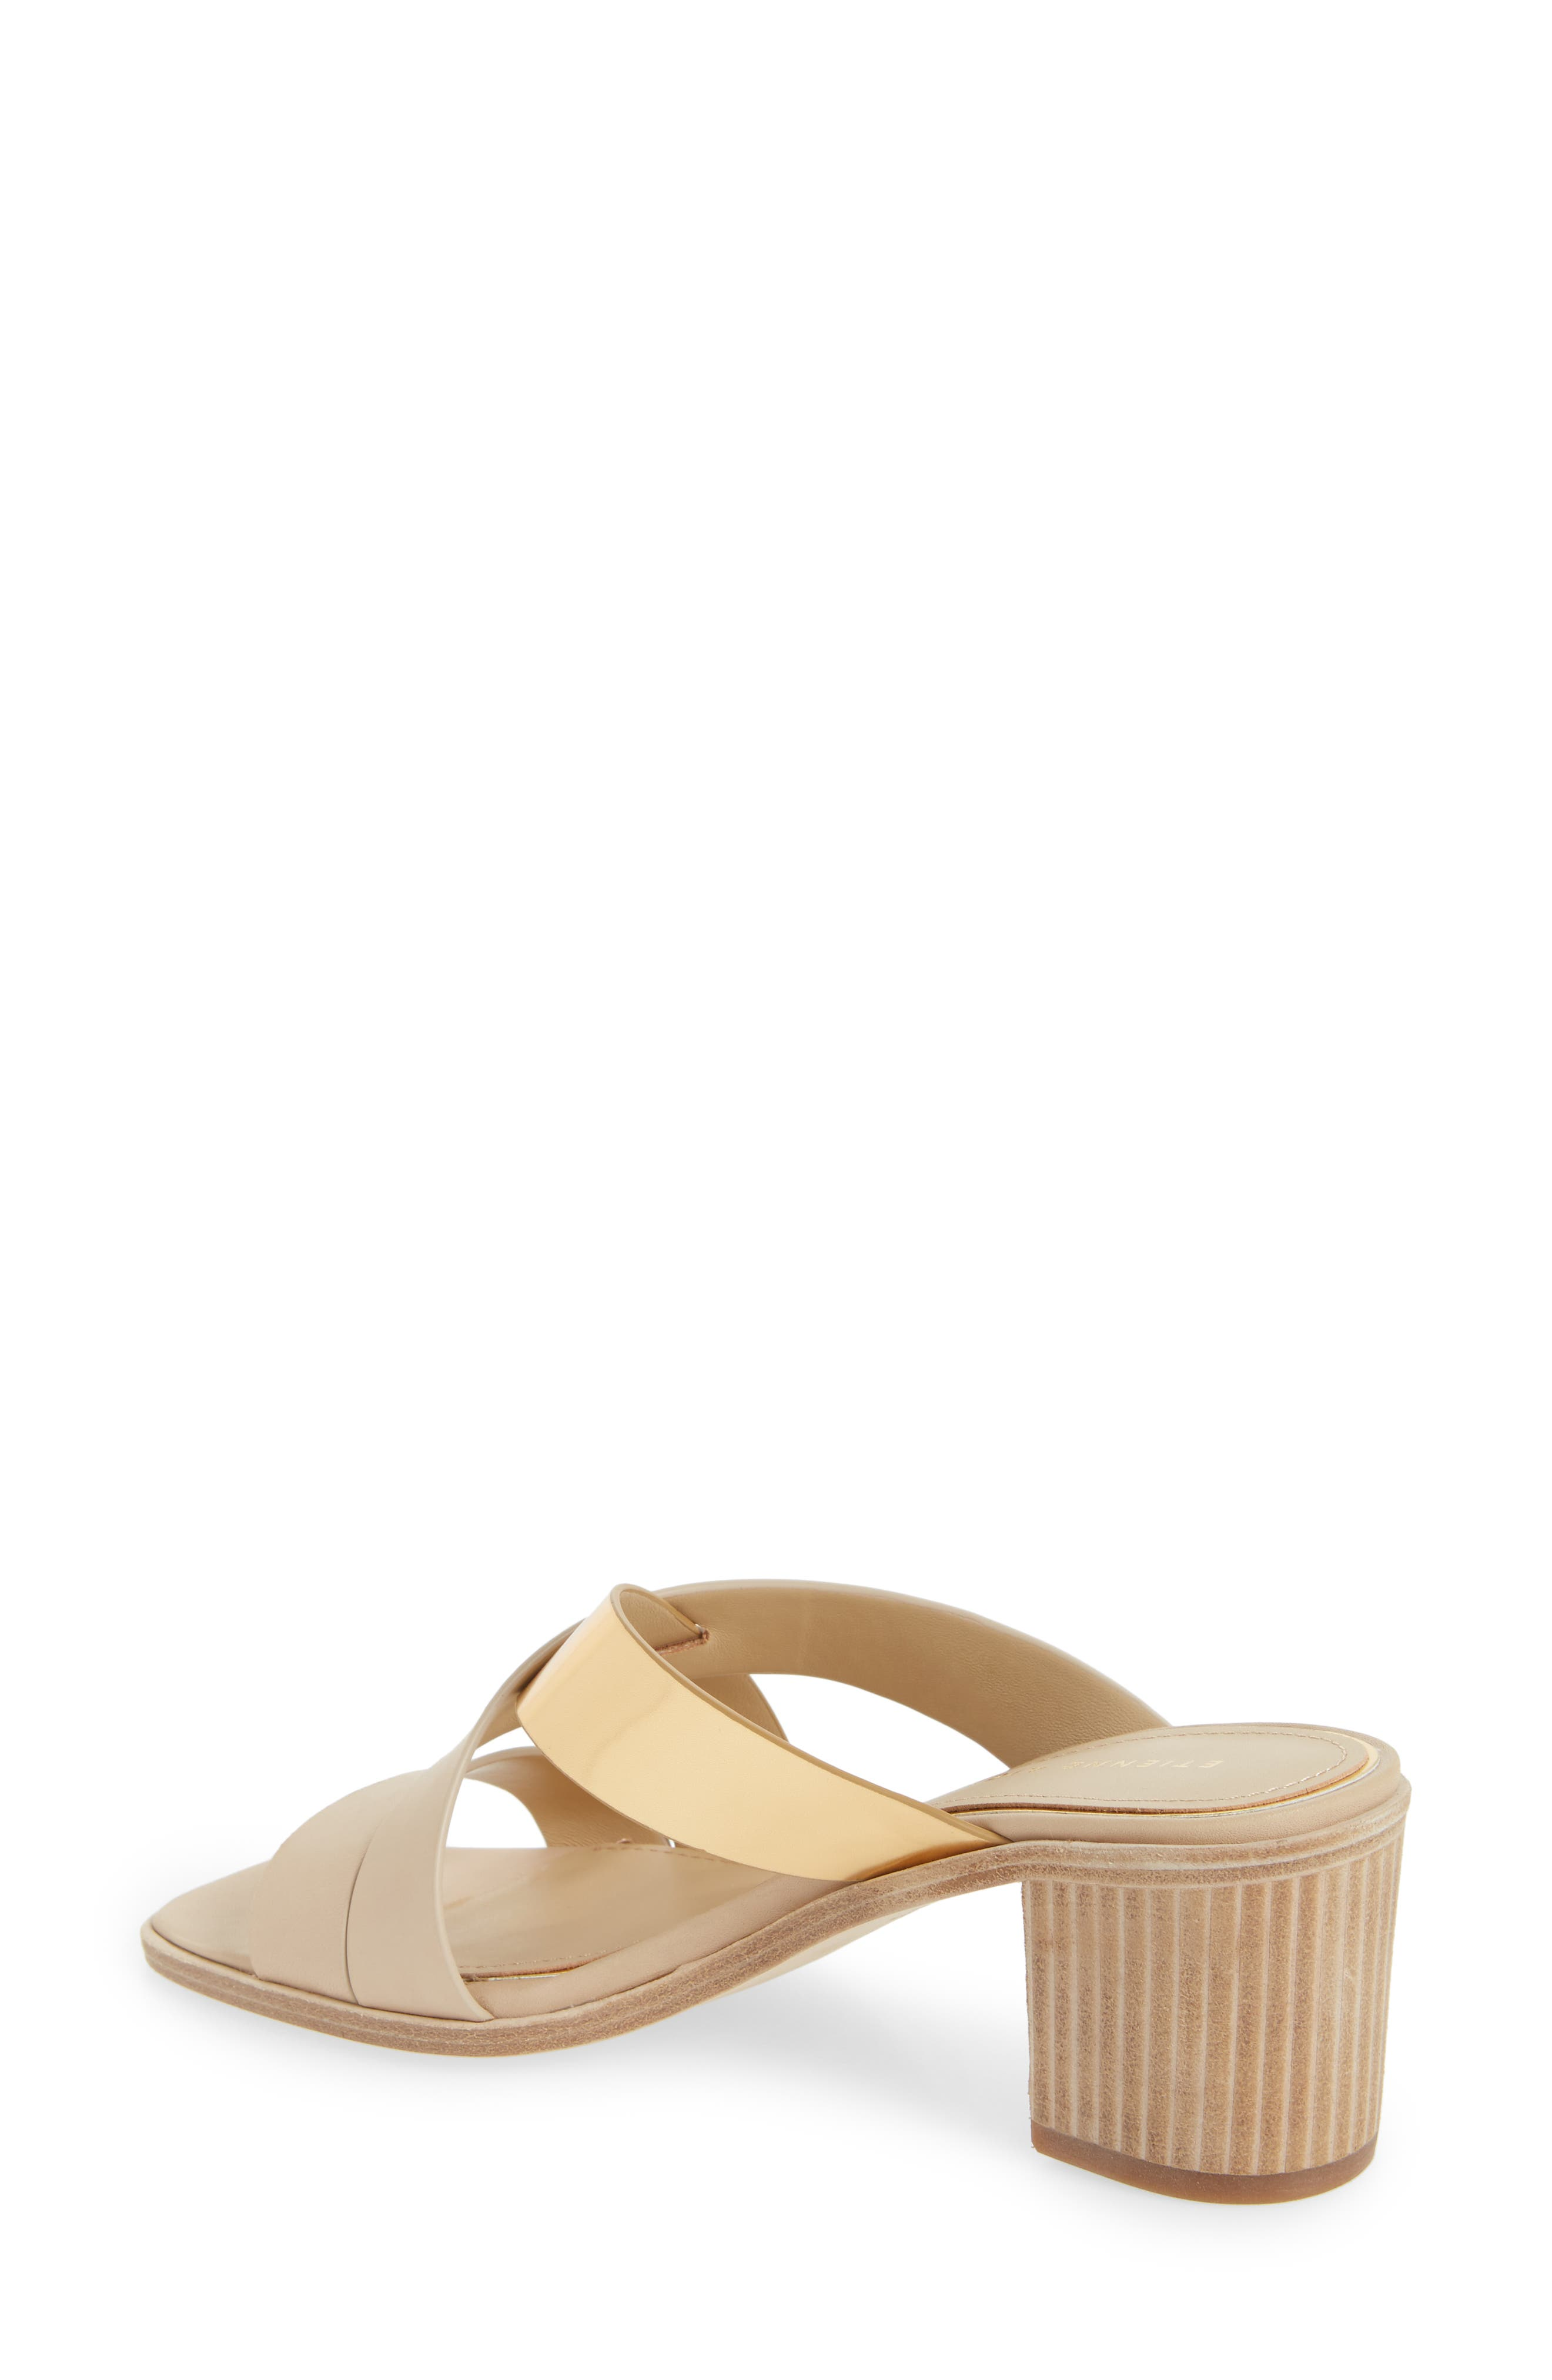 Negroni Cross Strap Mule Sandal,                             Alternate thumbnail 2, color,                             Natural/ Gold Leather